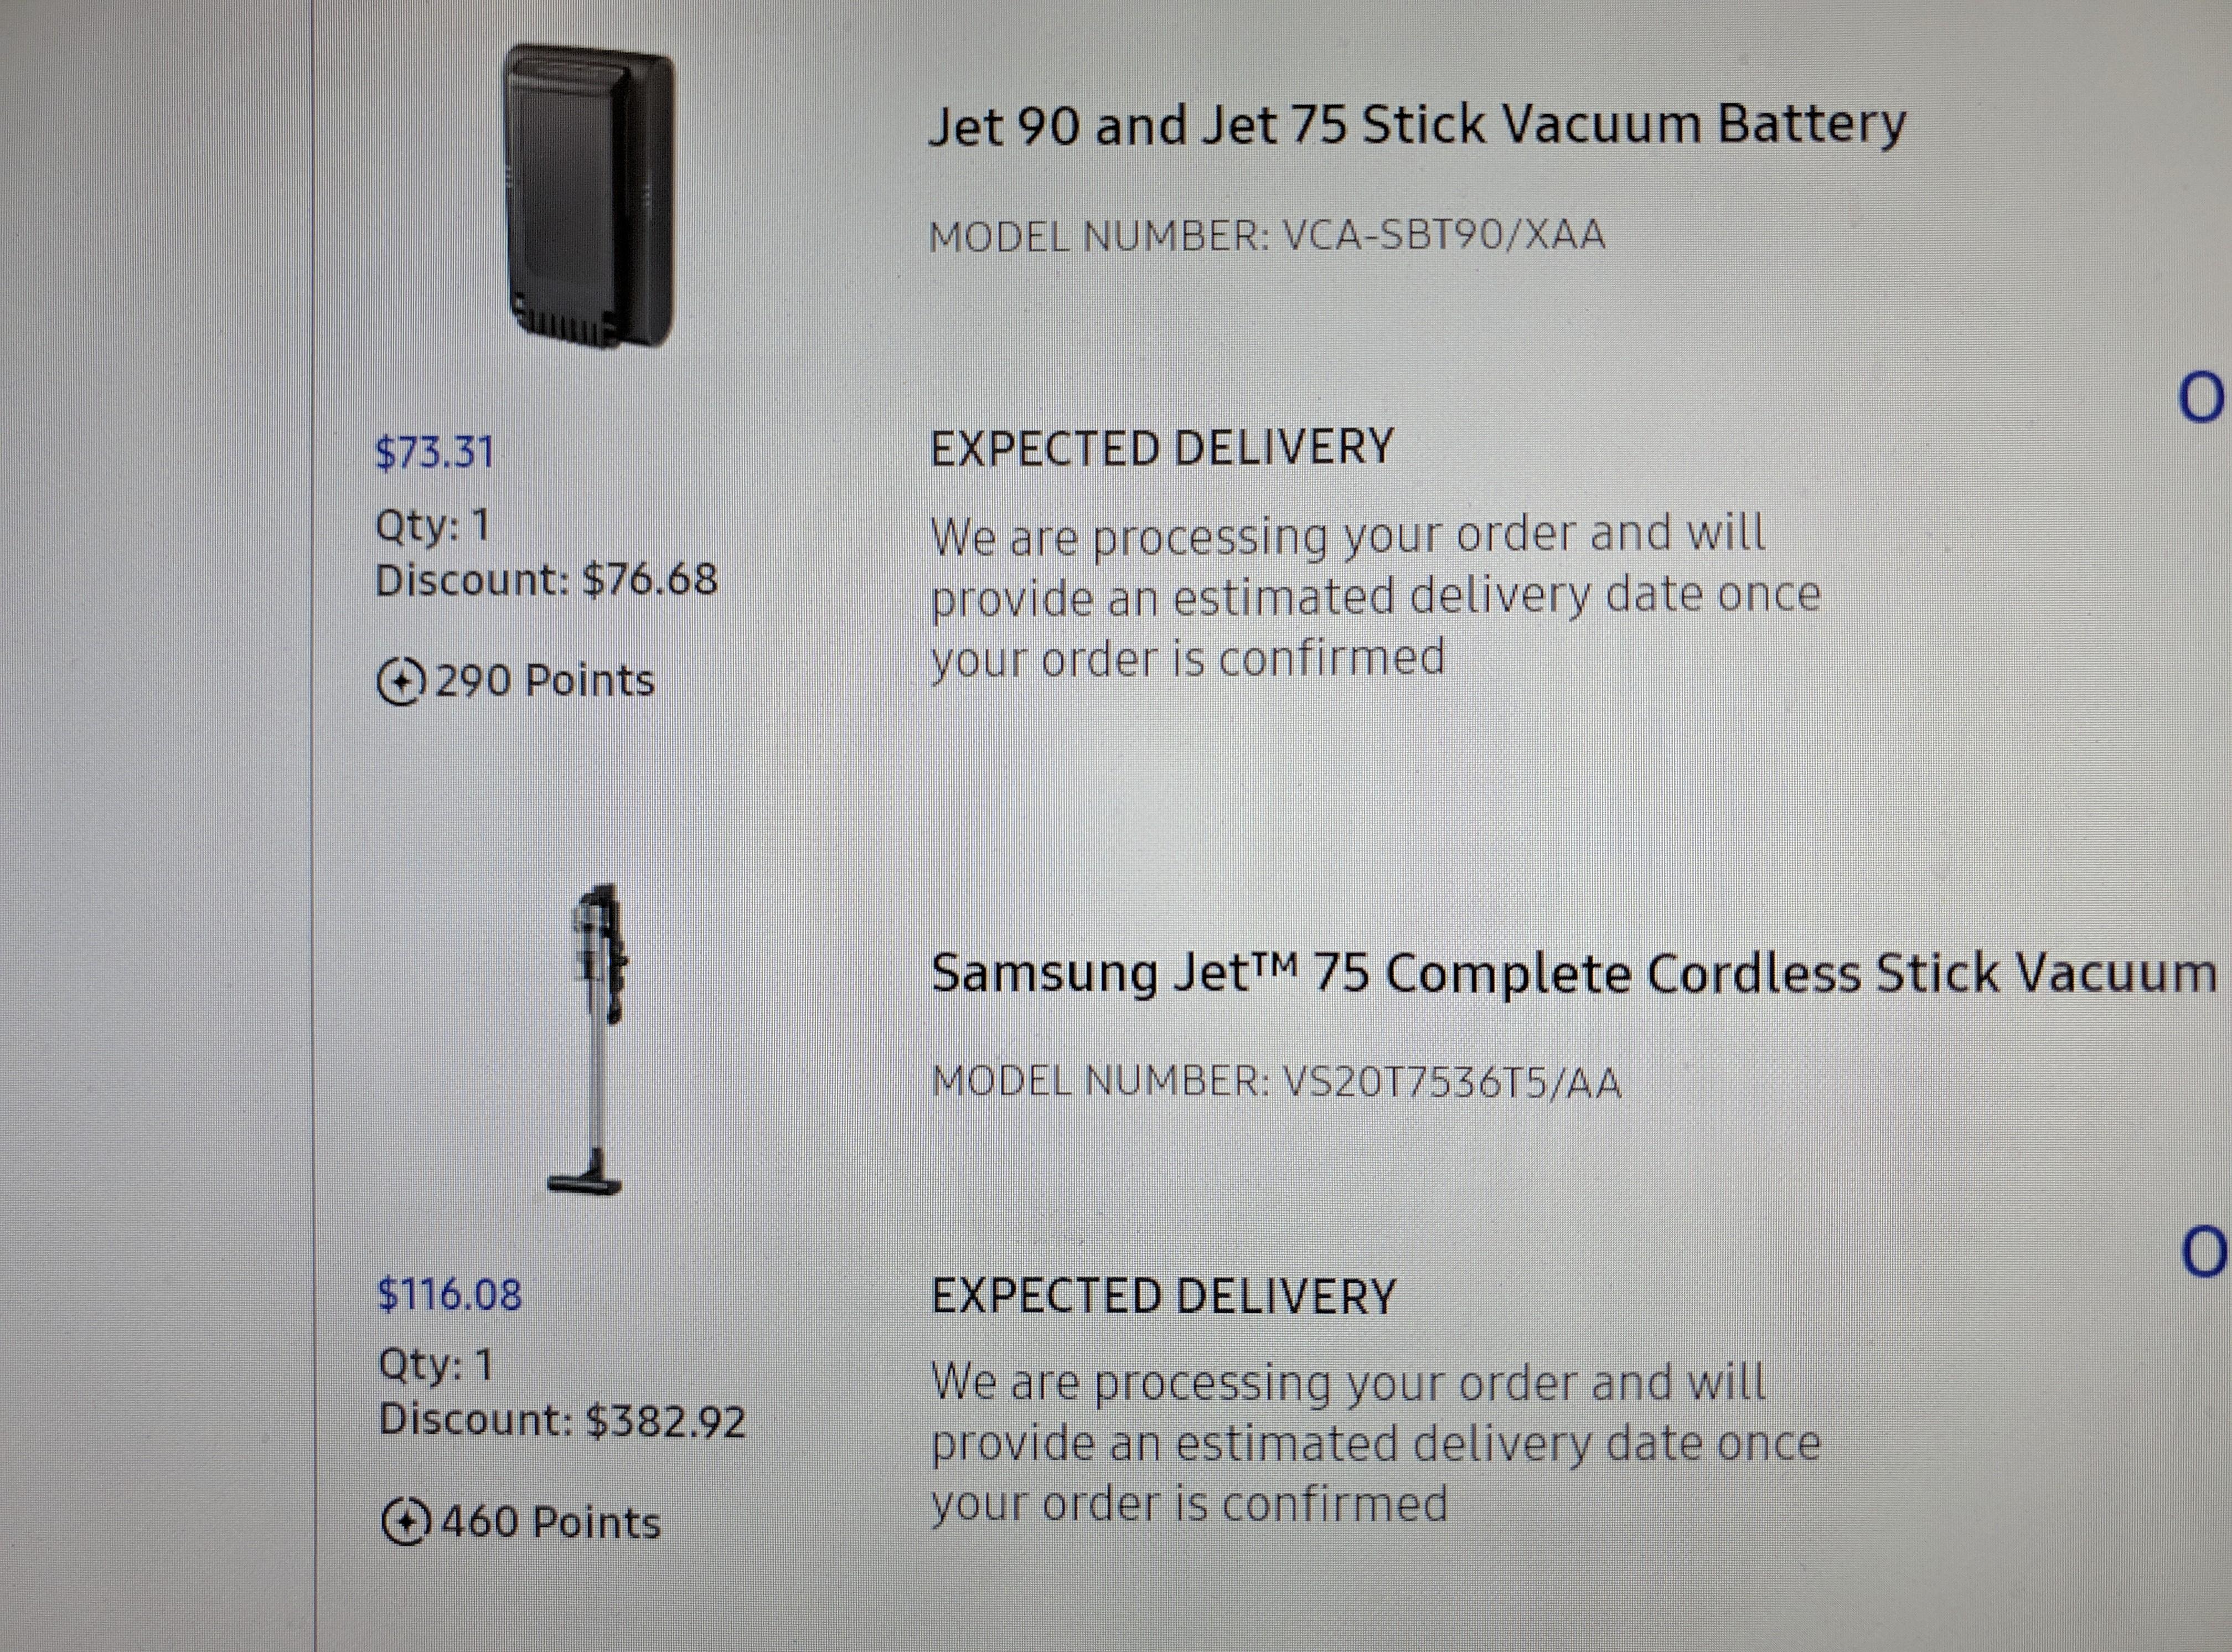 Samsung Jet 75 vacuum and spare battery $189.39  Edu account YMMV